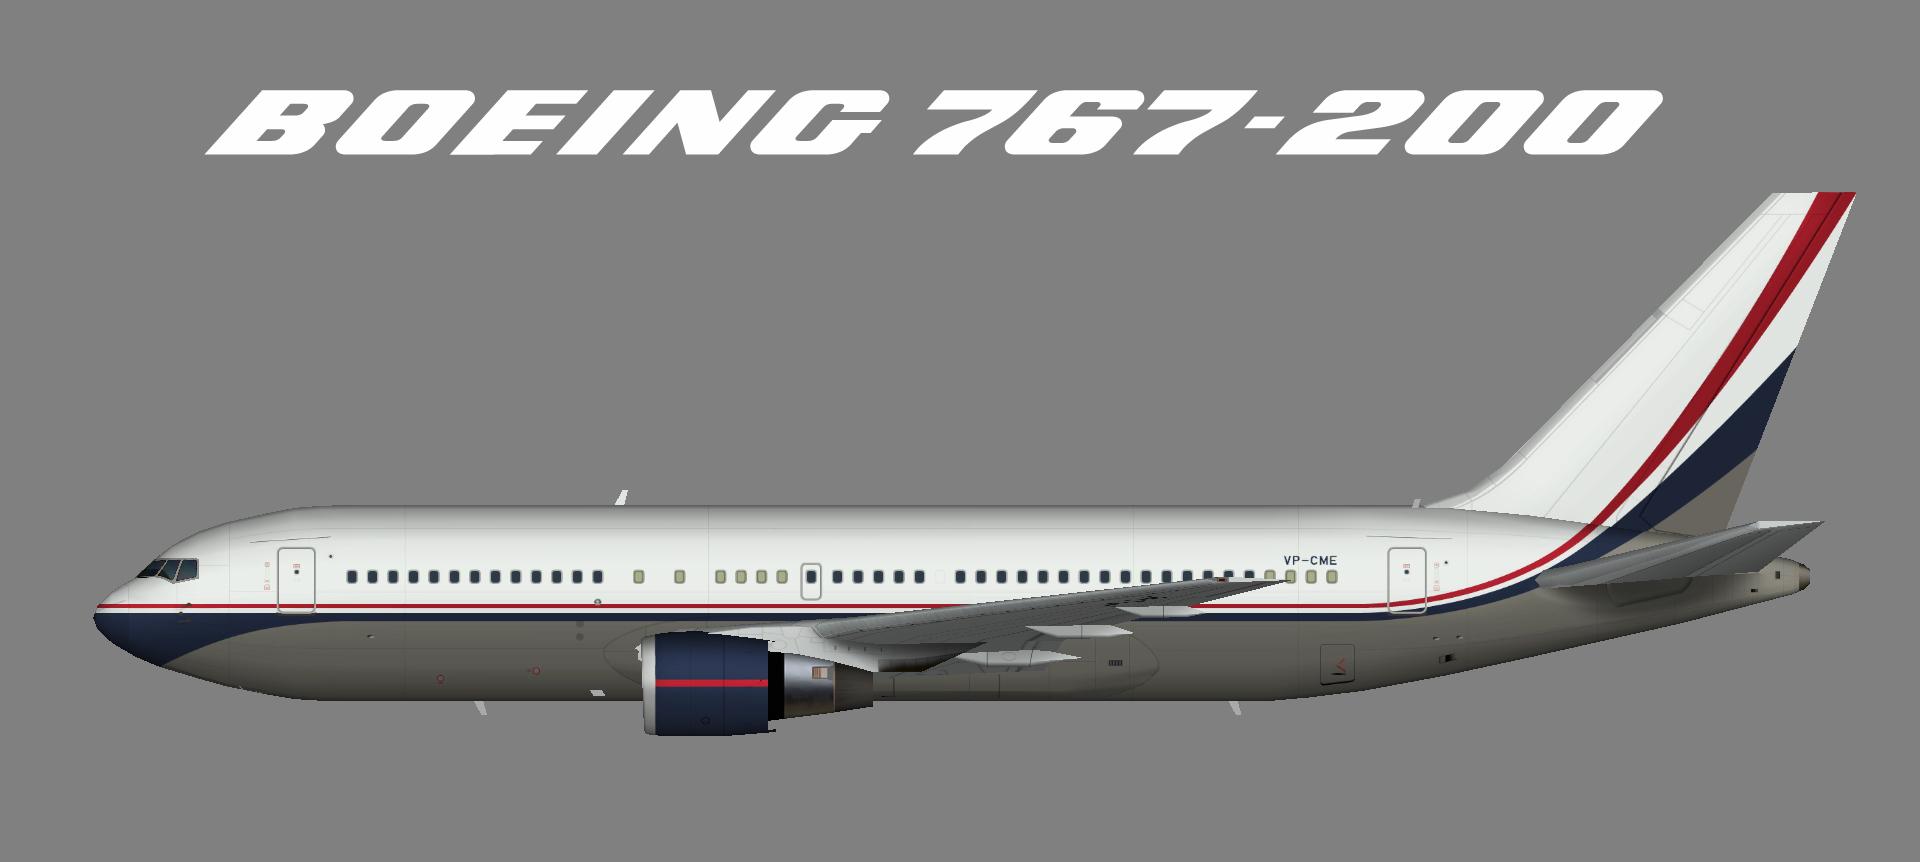 Midroc Aiviation 767-200